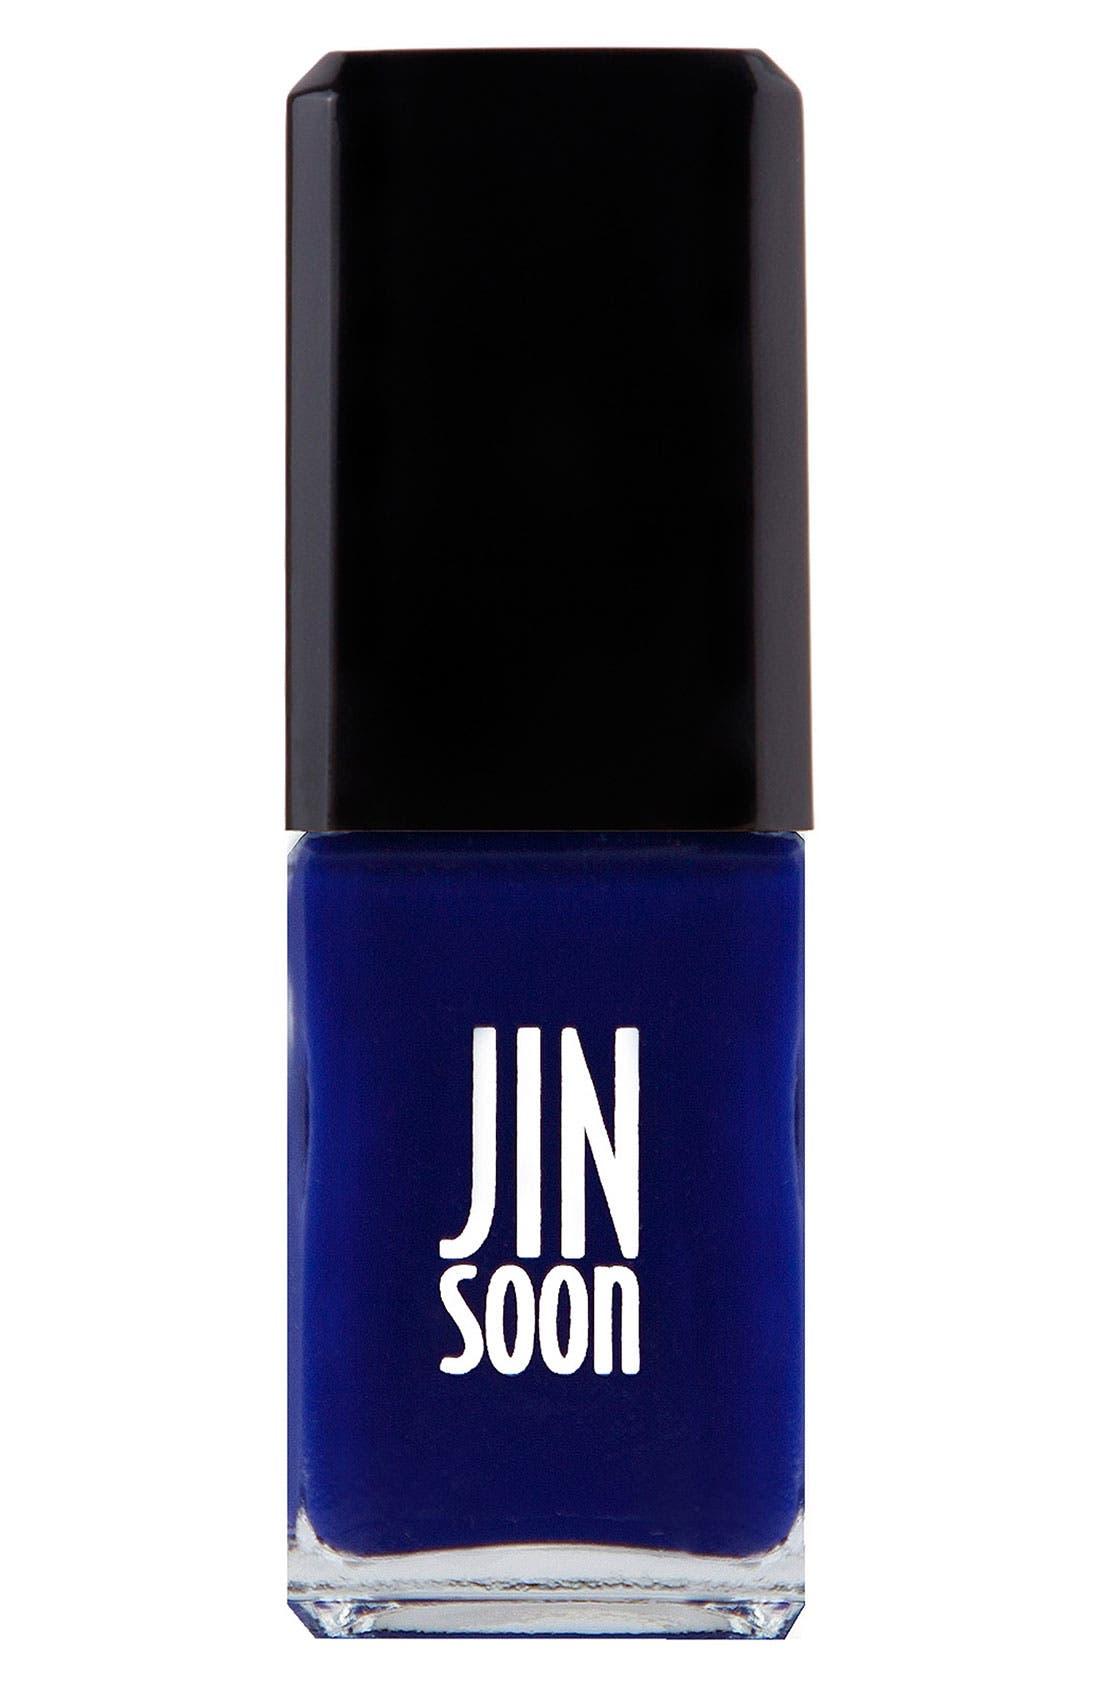 JINsoon 'Blue Iris' Nail Lacquer